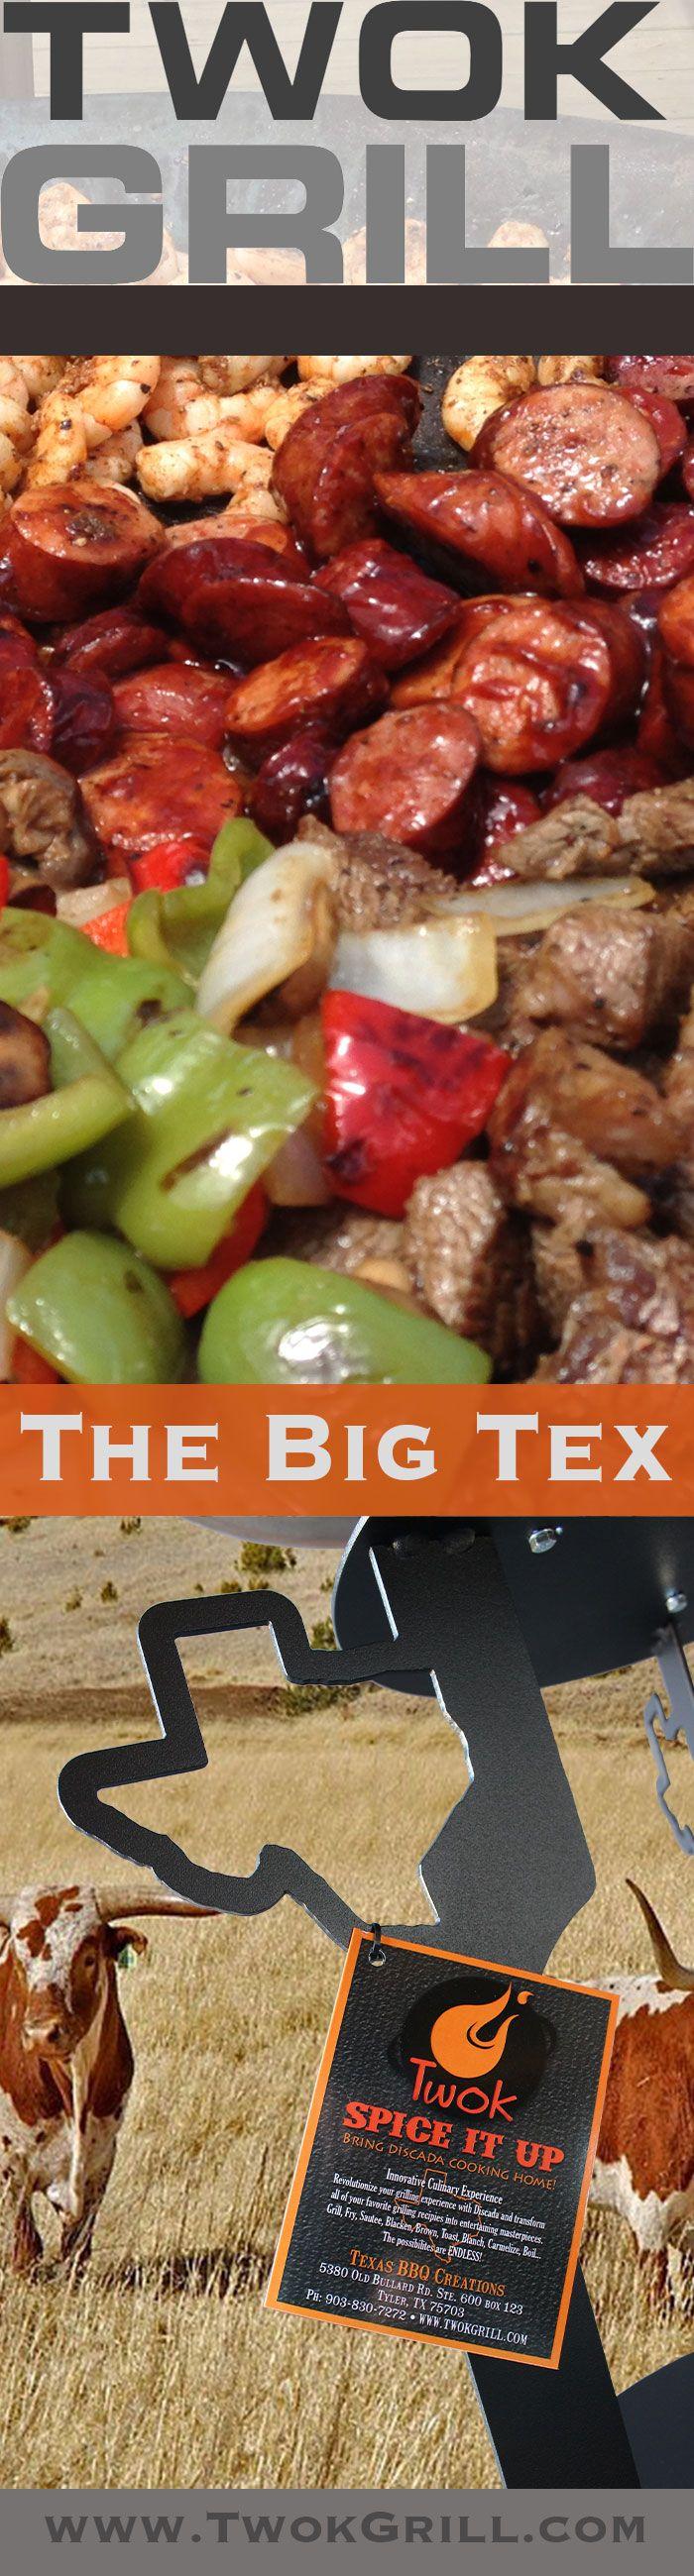 14 best mmmmm food images on pinterest woks grills and